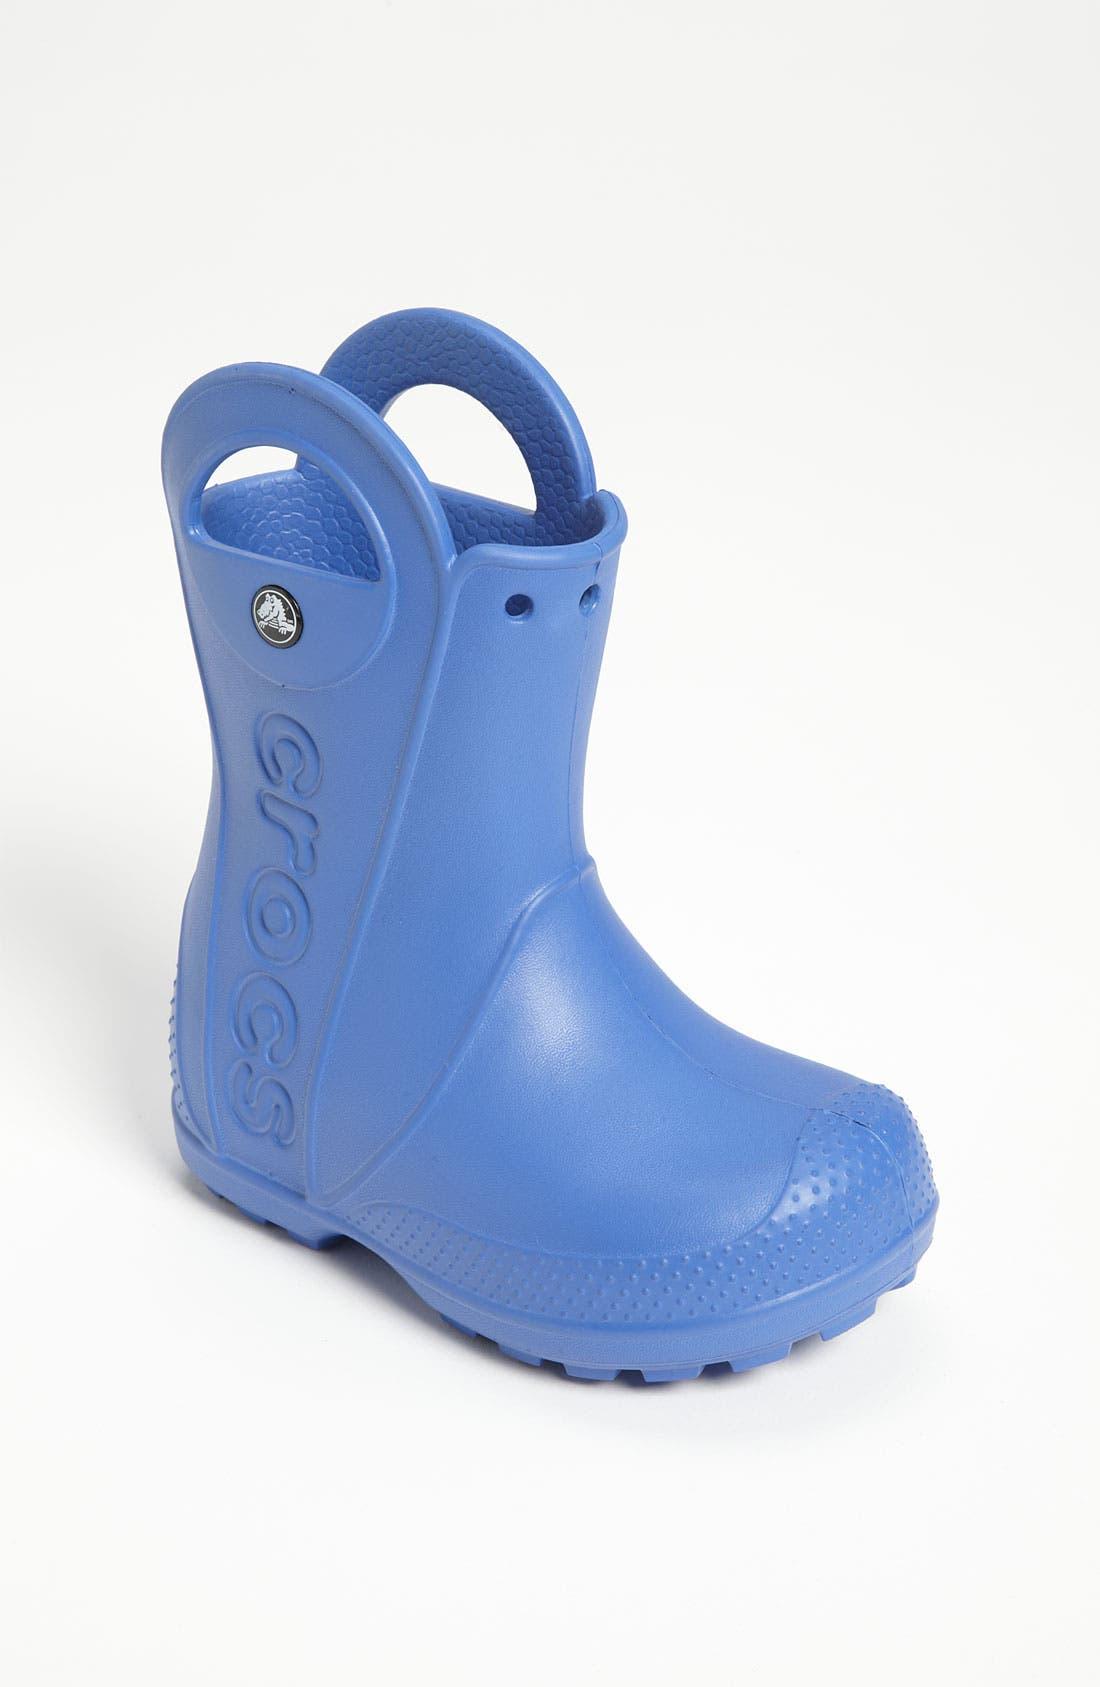 Main Image - CROCS™ 'Handle It' Rain Boot (Walker, Toddler & Little Kid)